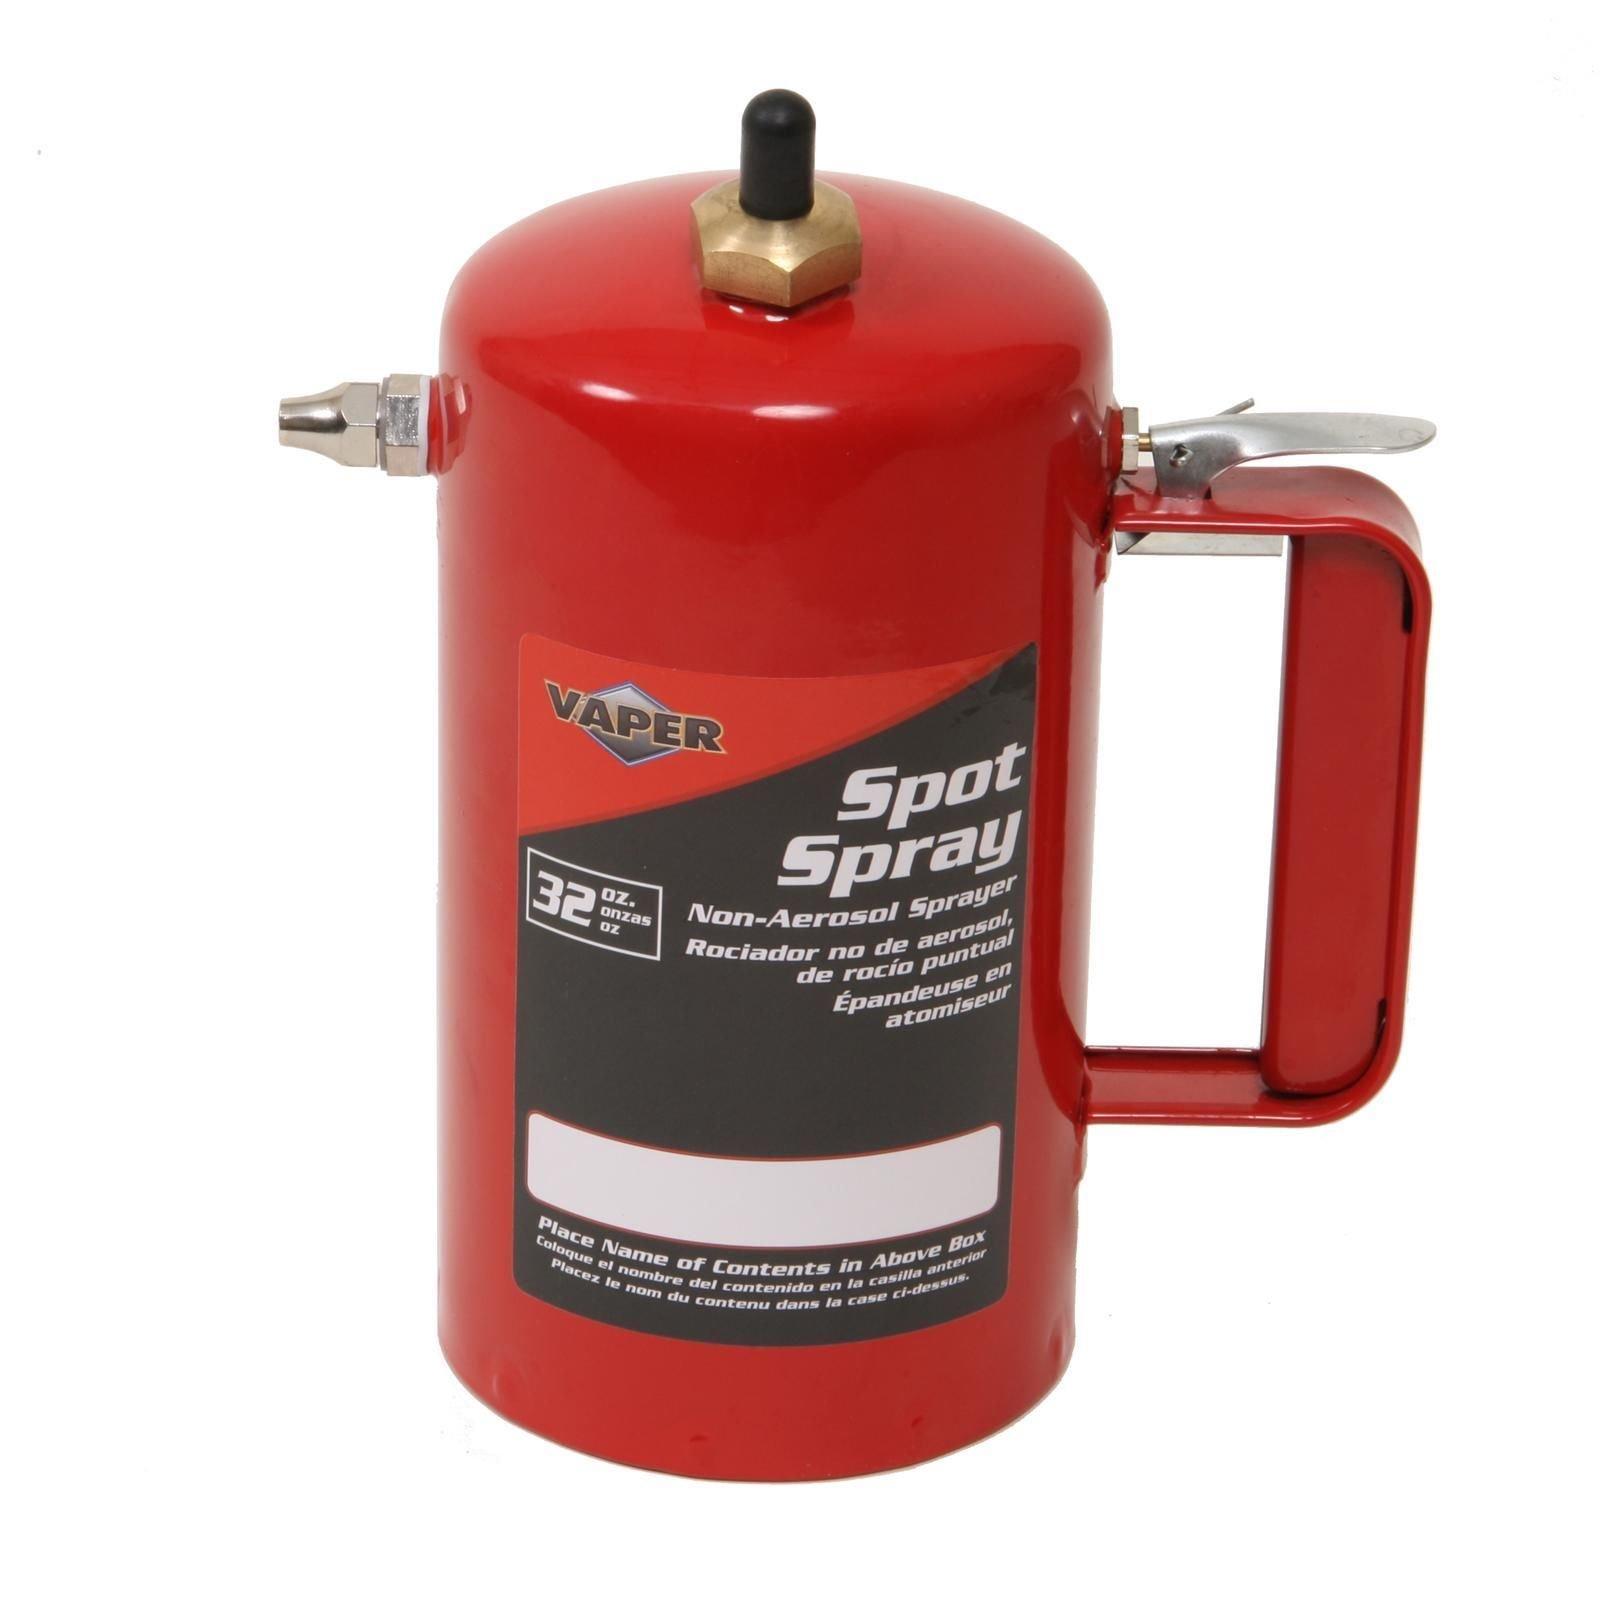 Vaper 19419 Red Spot Spray Non-Aerosol Sprayer (Red) - 32 oz.